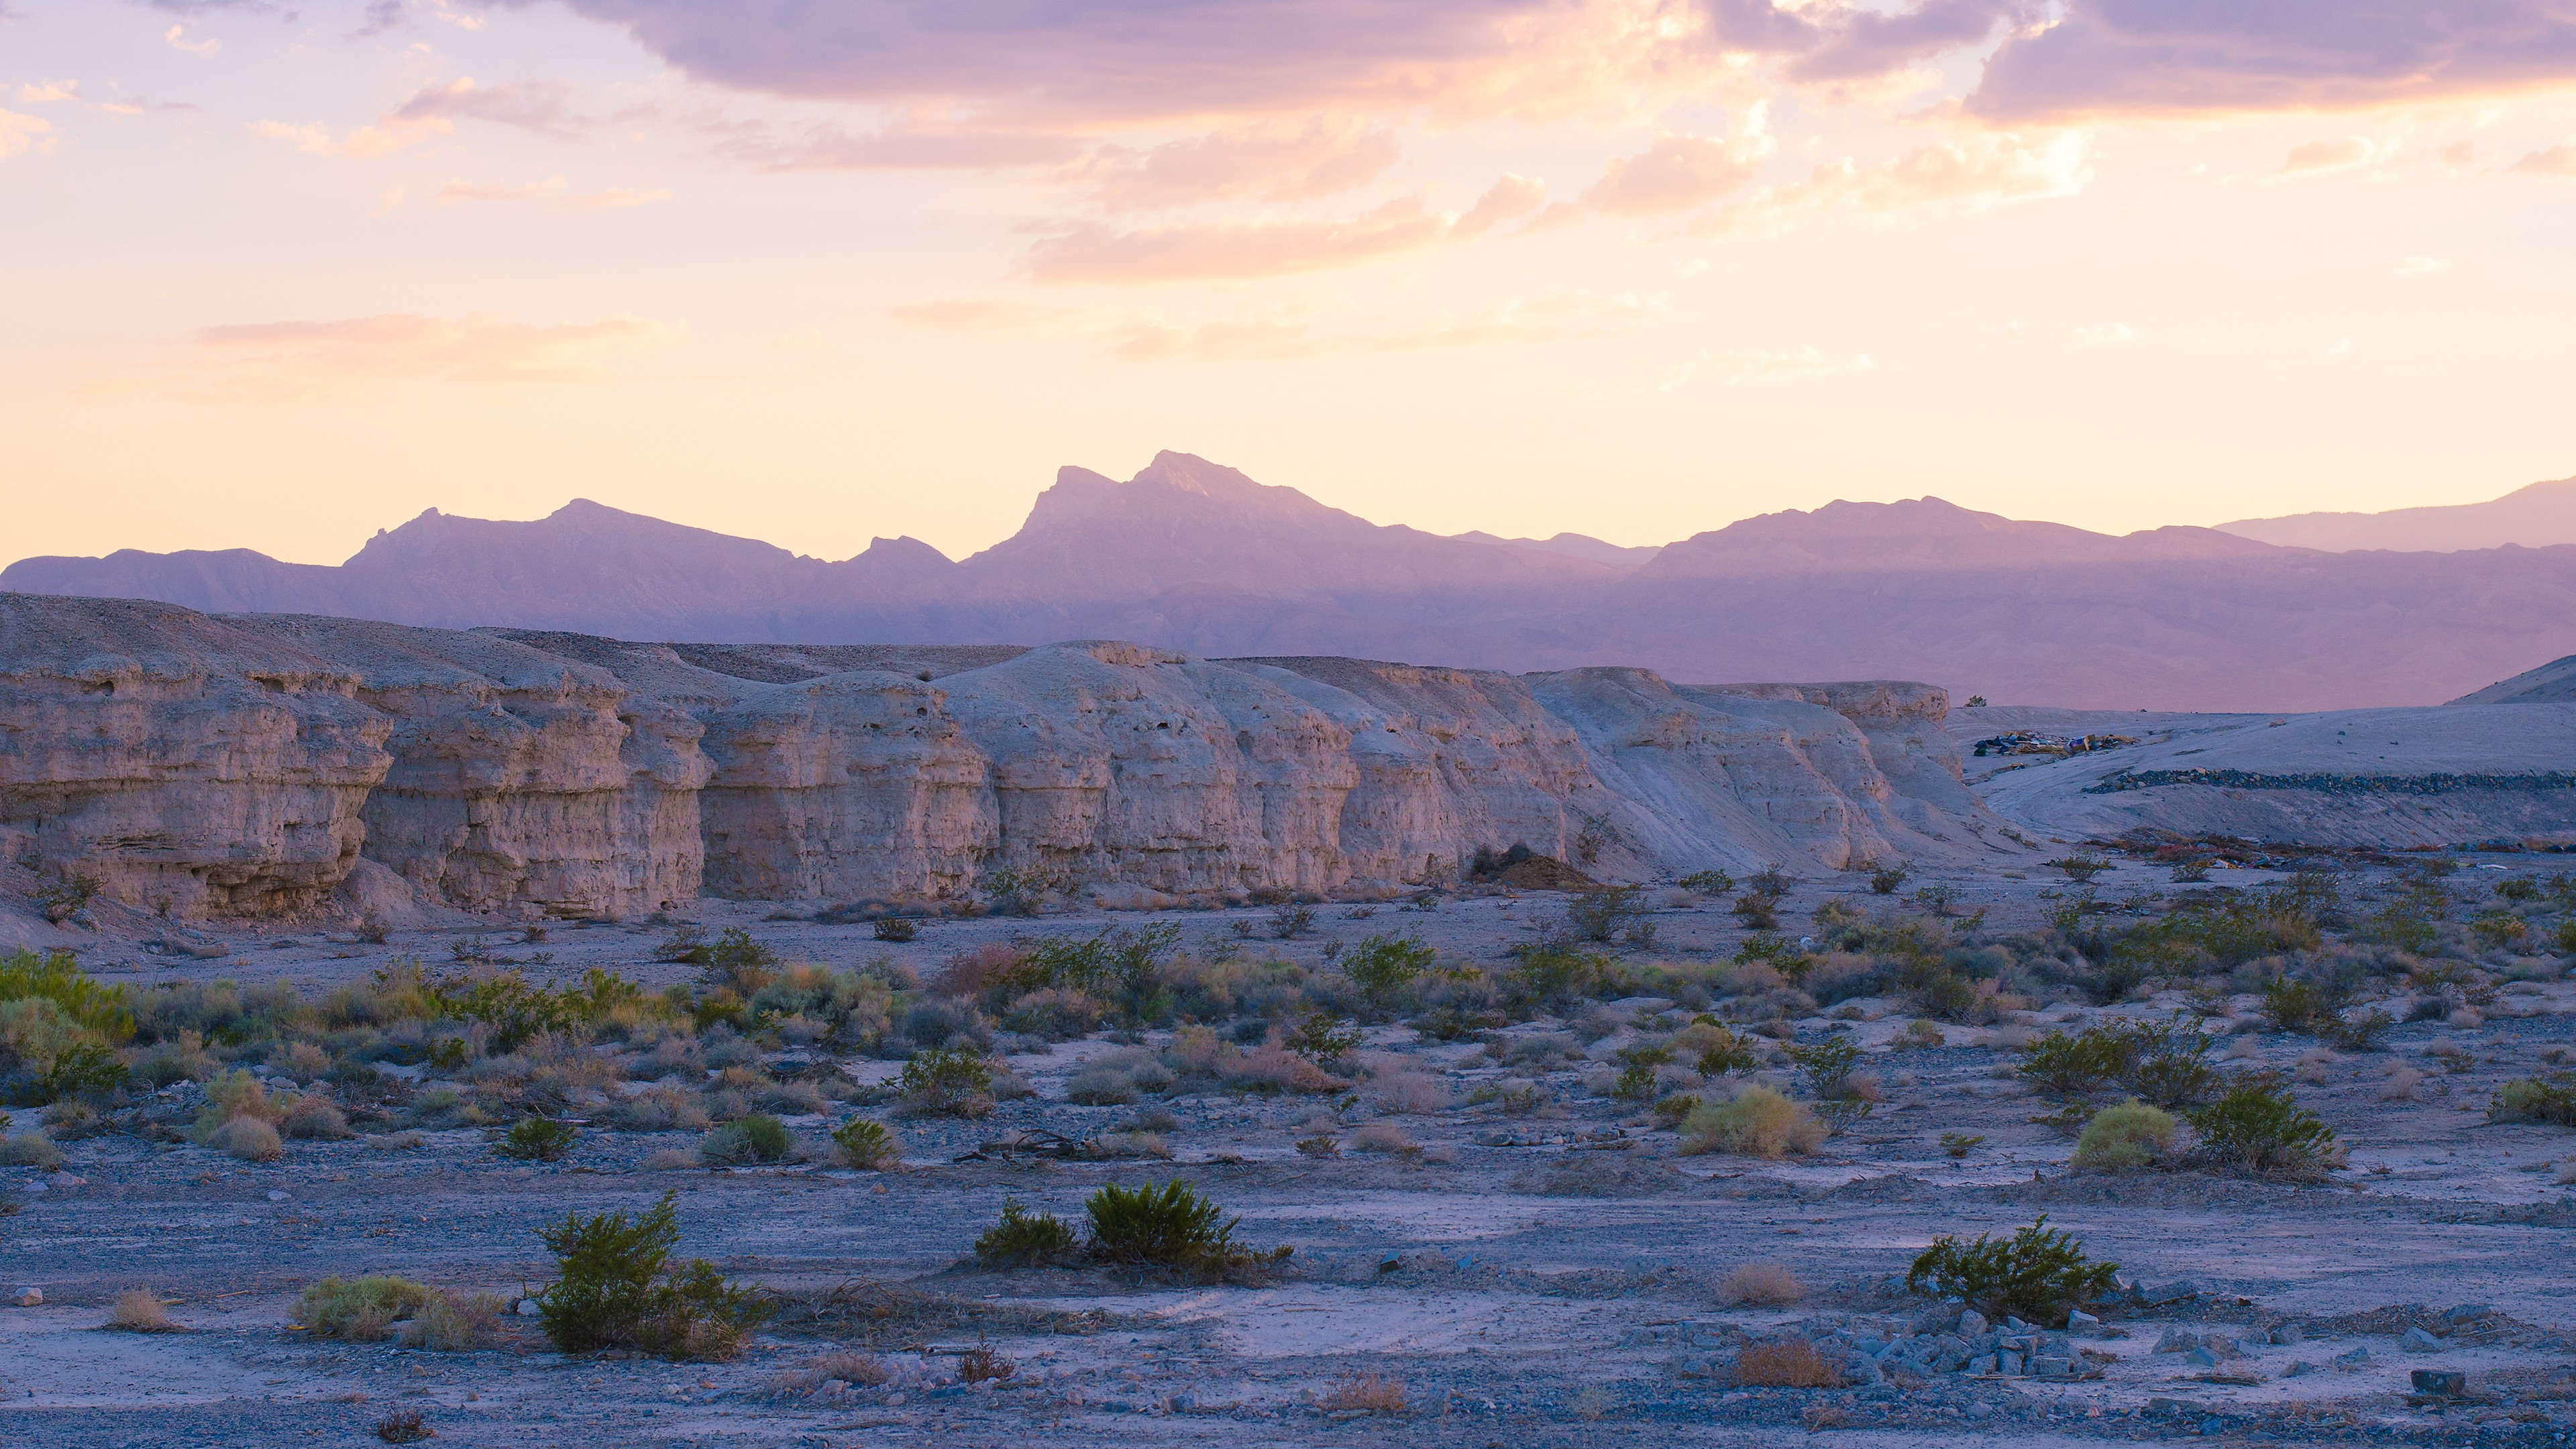 General 3840x2160 desert mountains nature landscape